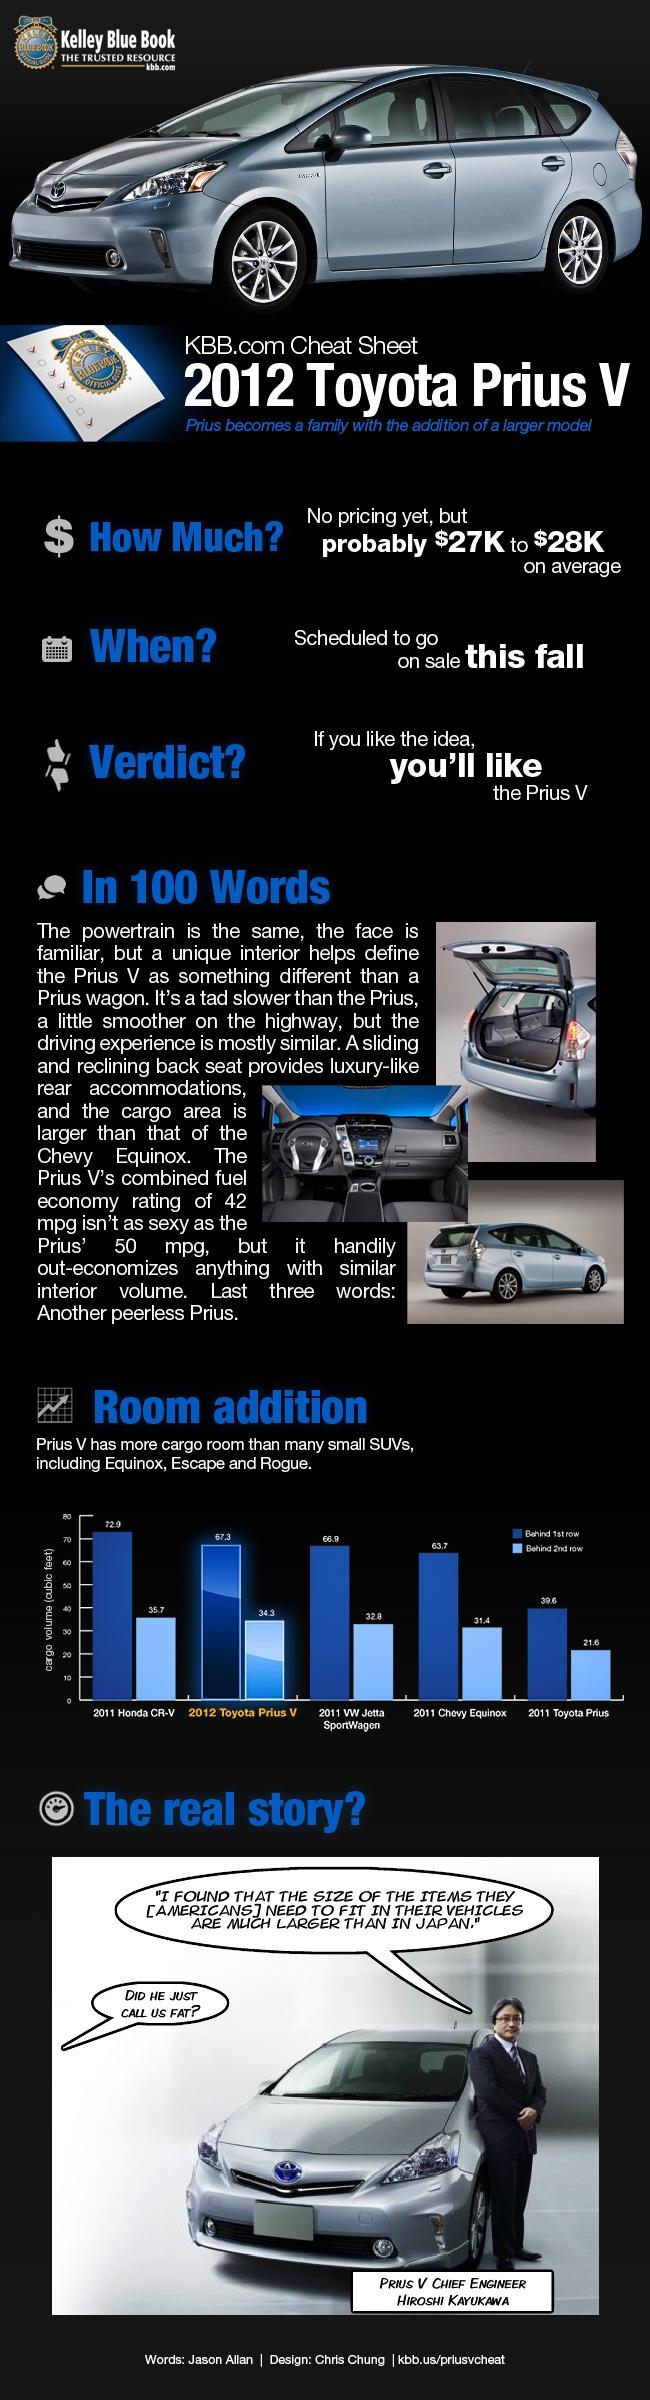 2012 Toyota Prius V InfographicCars Facts, Prius Toyotalov, Toyota Hybrid,  Website, 2012 Toyota, Auto Pick, Motors Infographic, Cars Infographic, Lists 2014